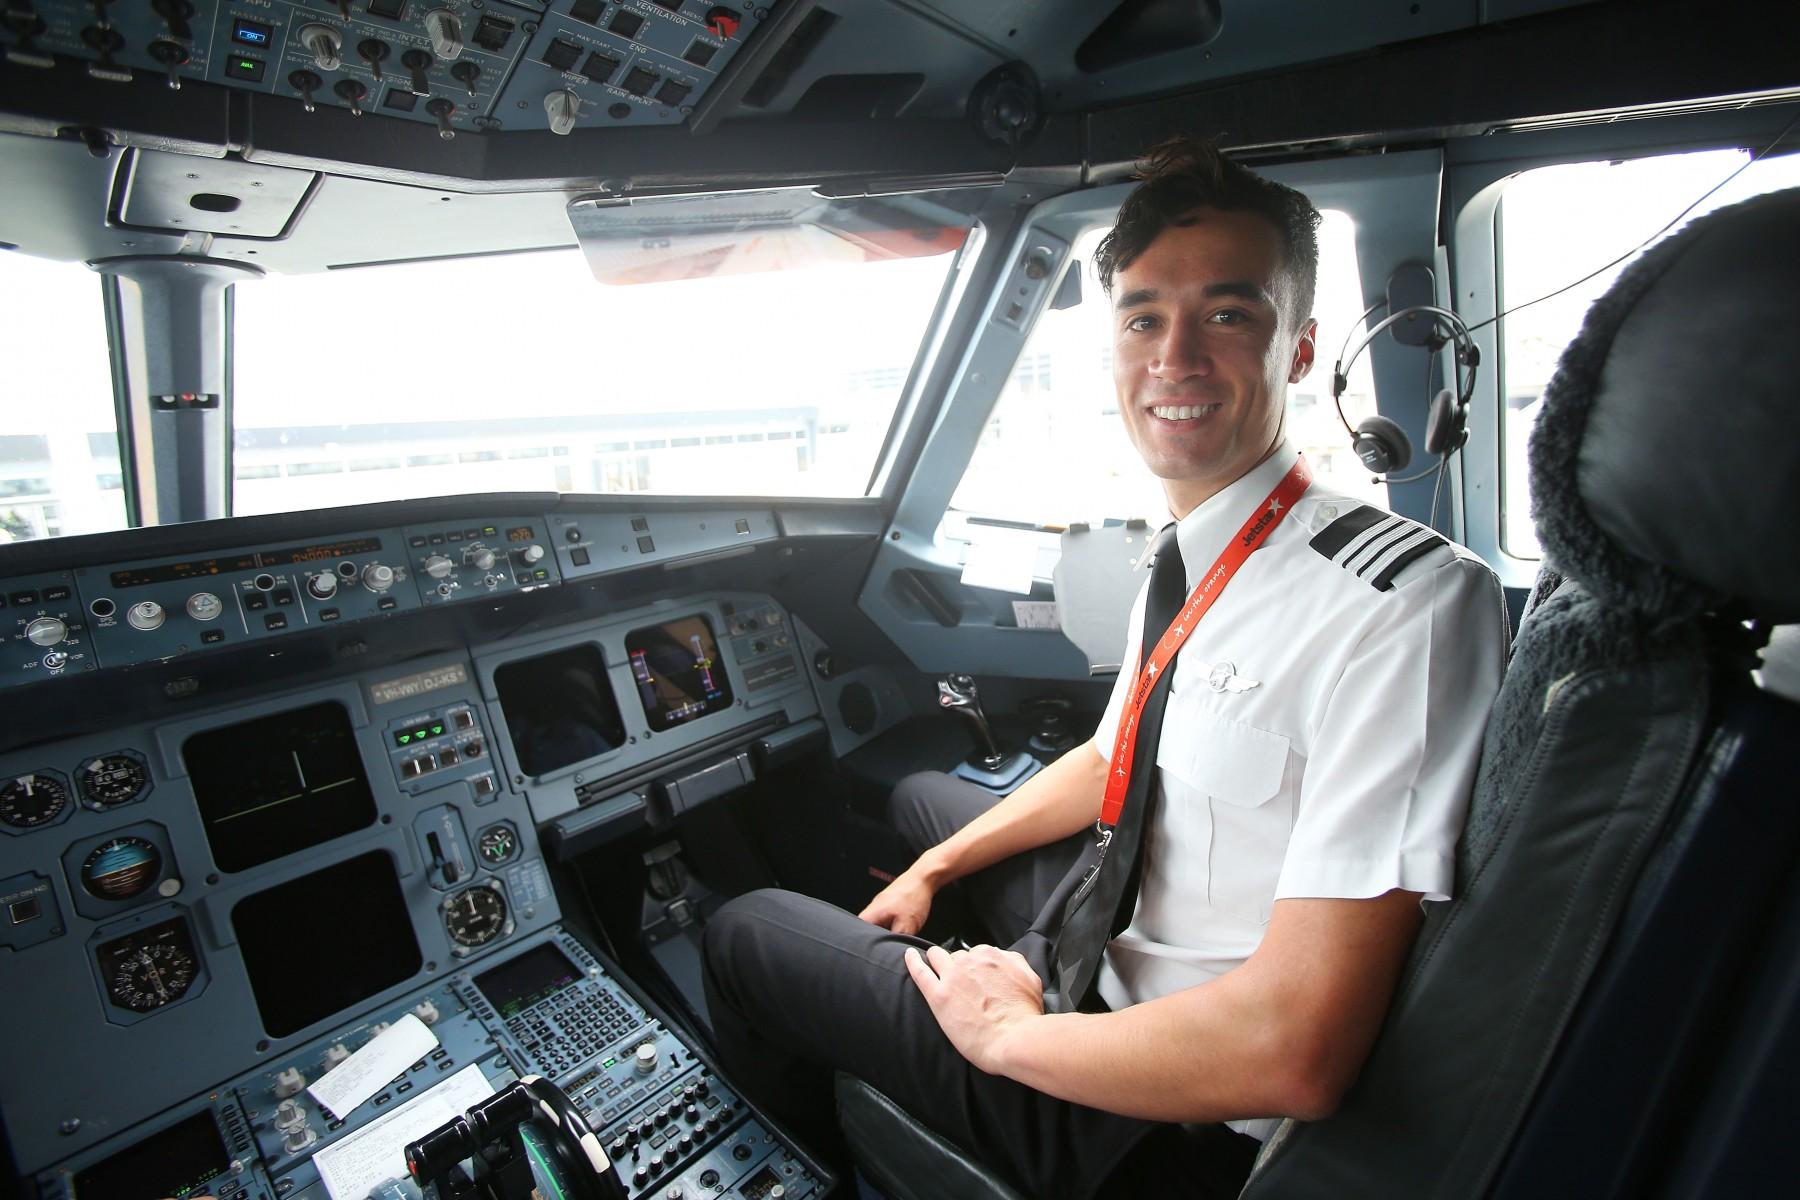 Jetstar S Exclusive Cadet Pilot Program Attracts Hundreds